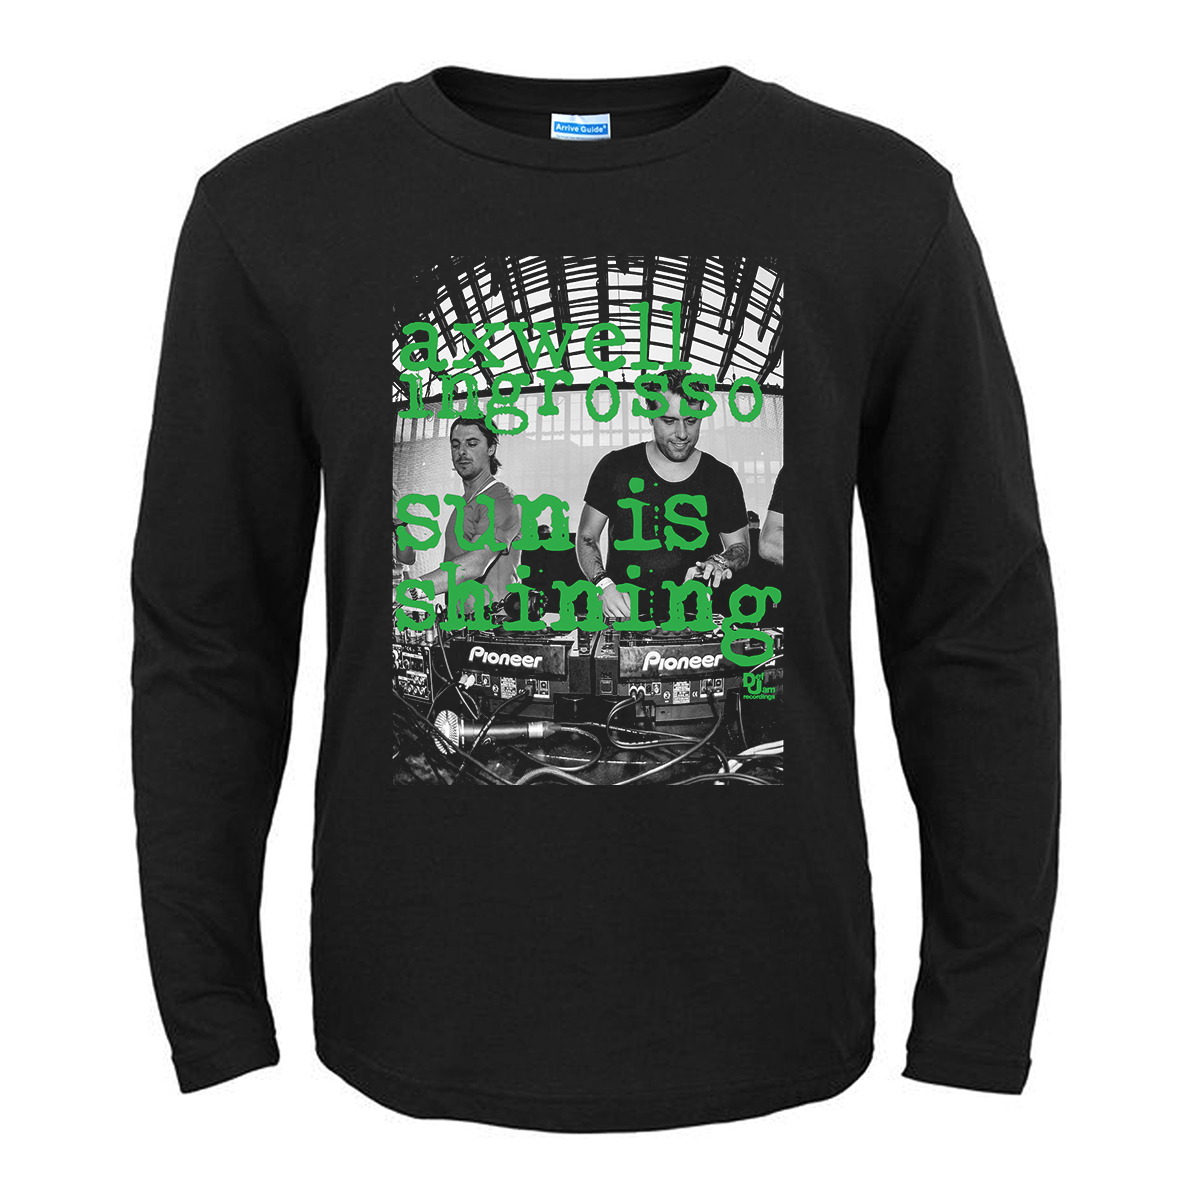 Merchandise T-Shirt Axwell Λ Ingrosso Sun Is Shining